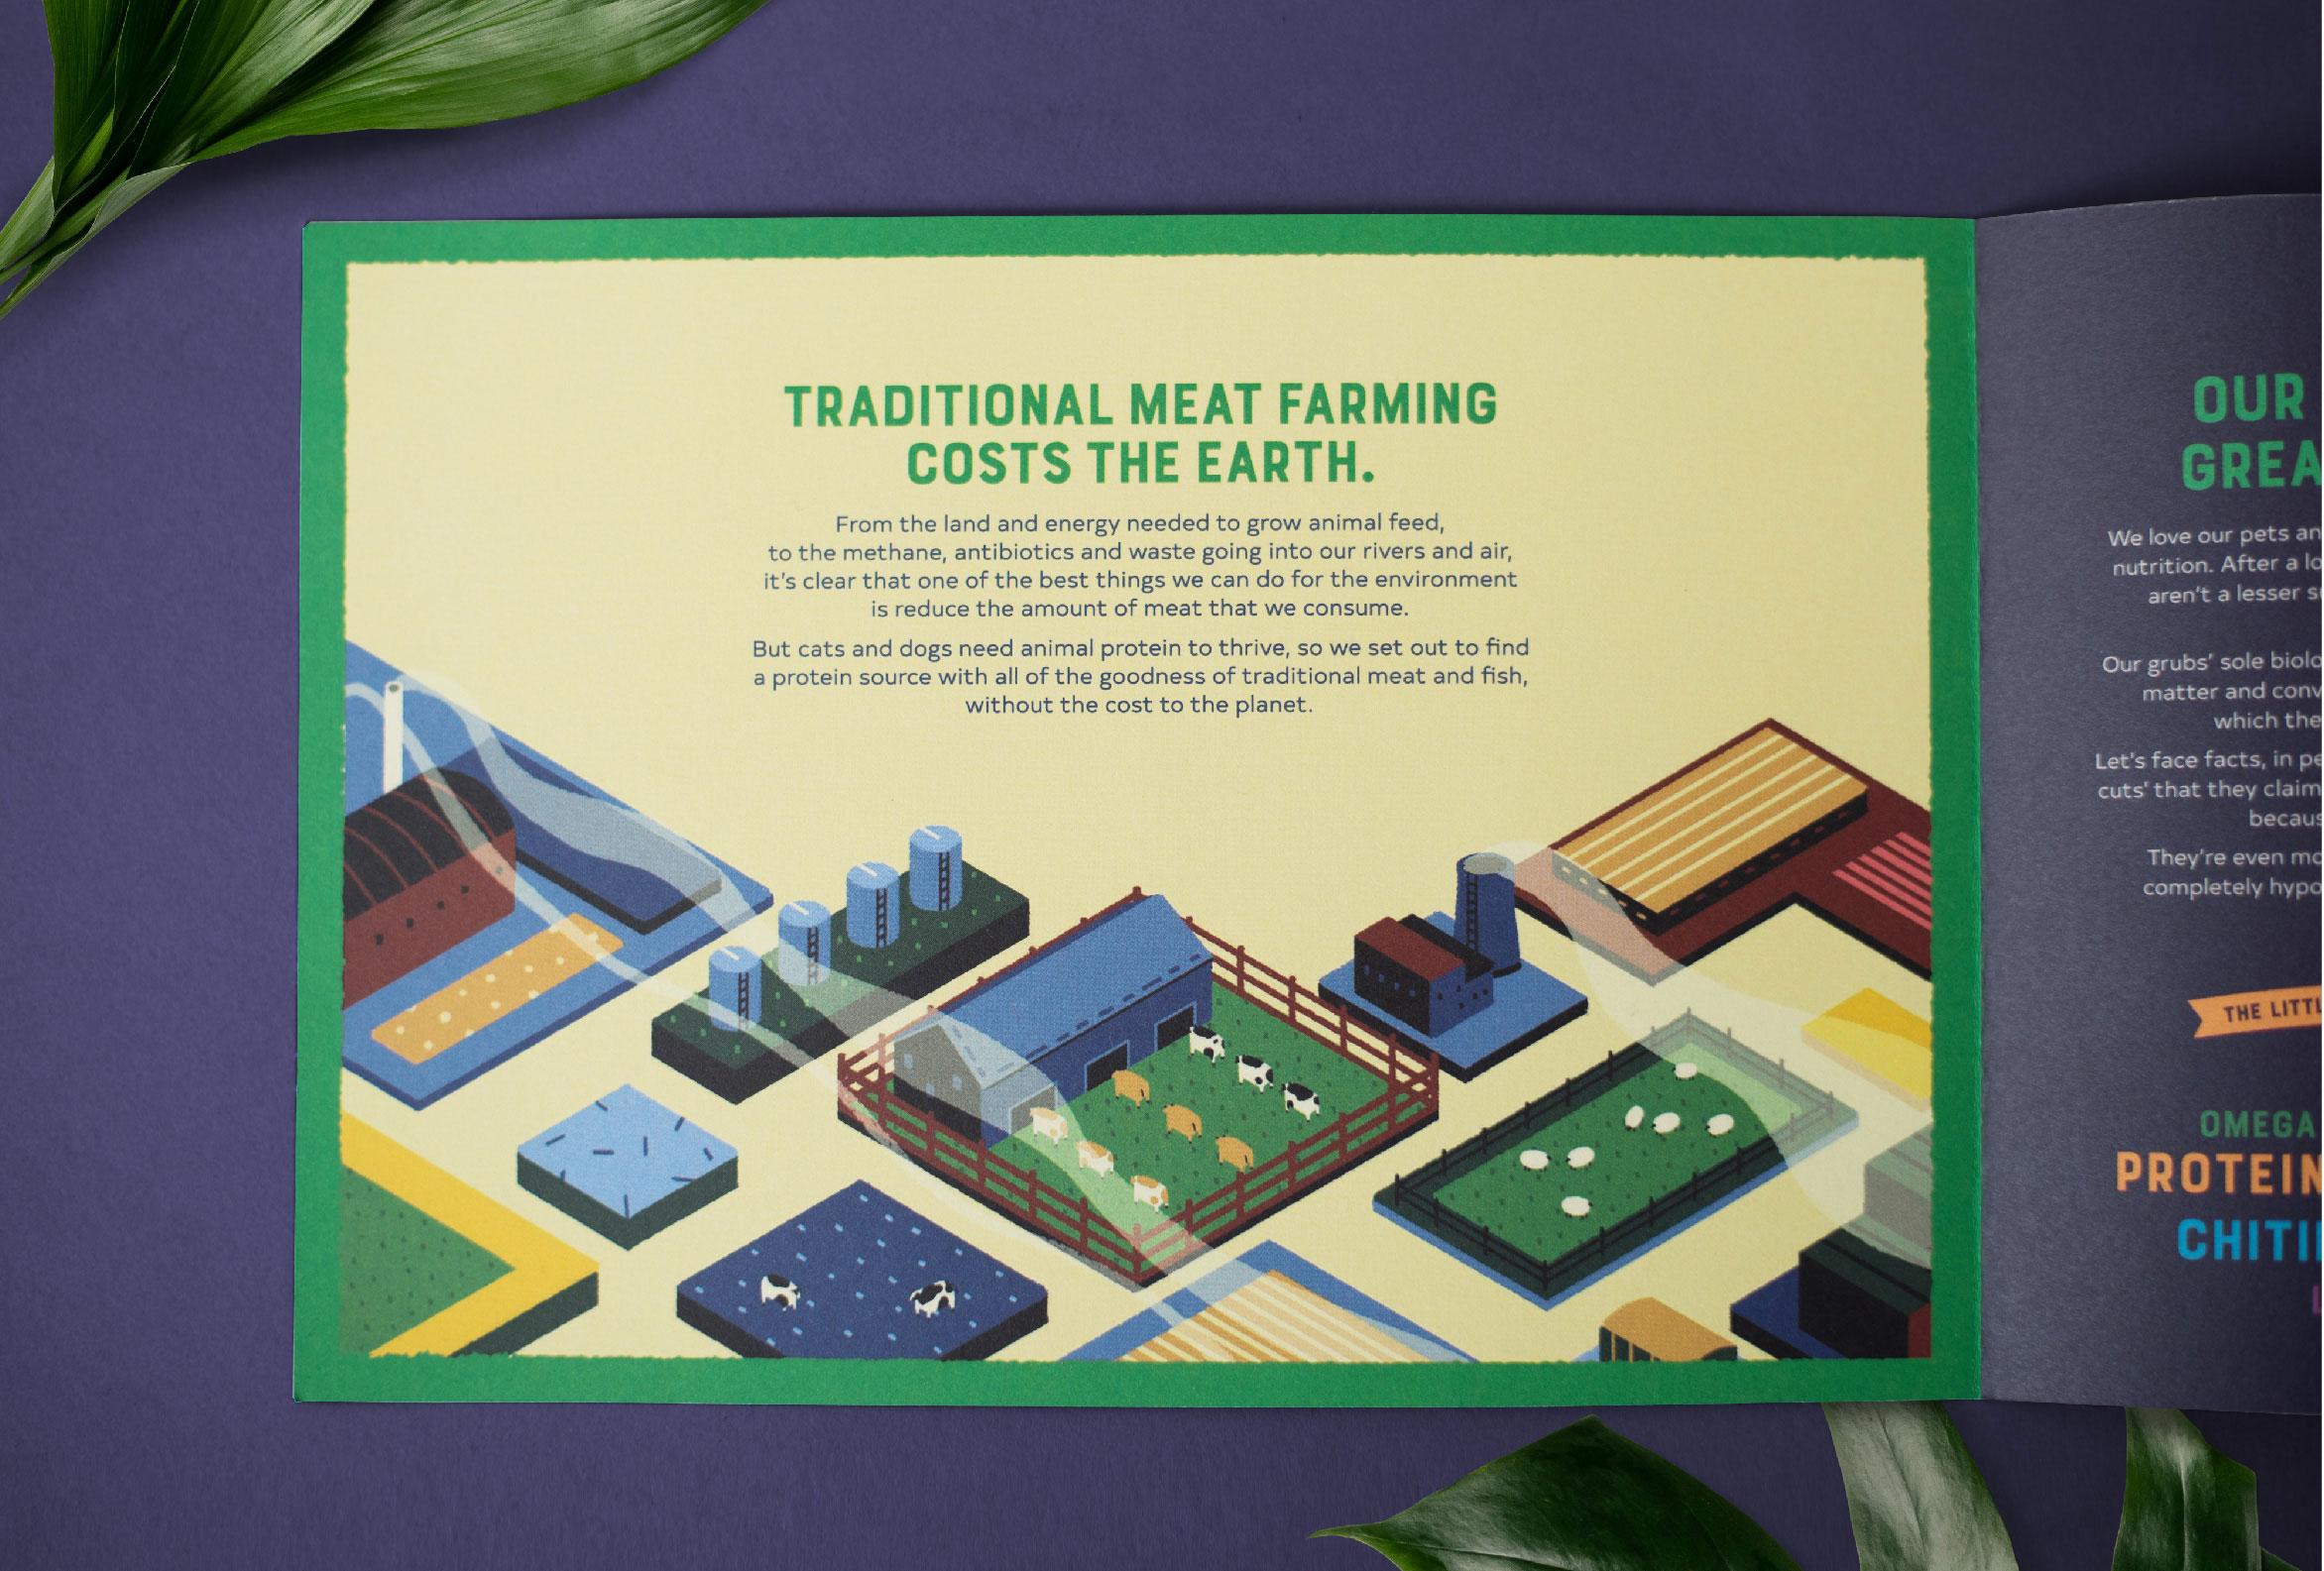 Yora-Leaflet-Farming-1-copy-5@2x-80